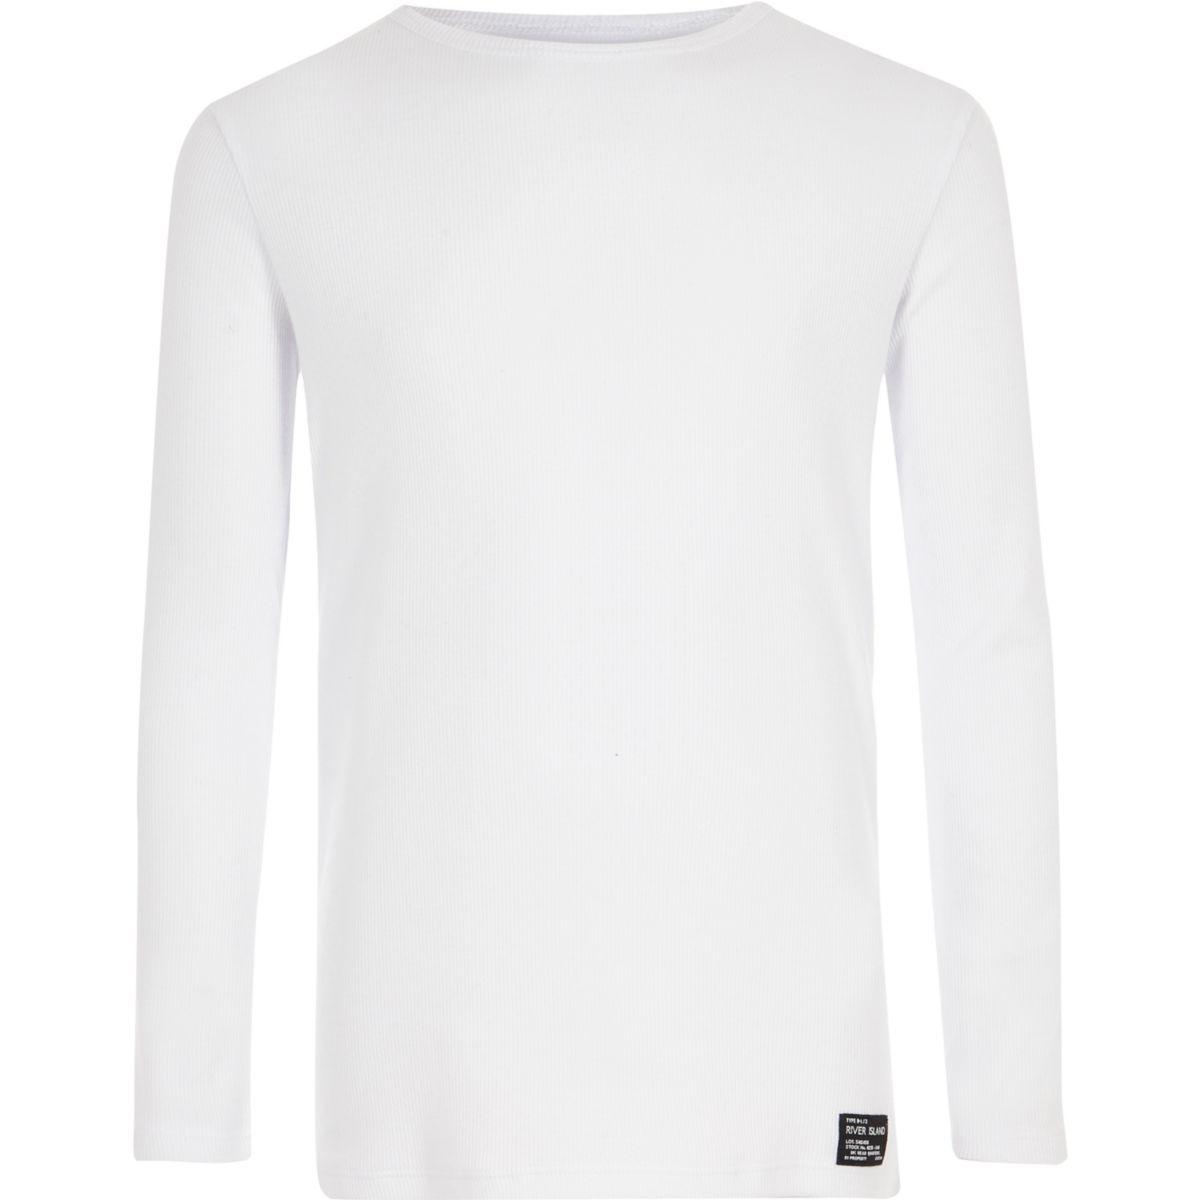 Boys white ribbed long sleeve t shirt long sleeve t for Ribbed long sleeve shirt